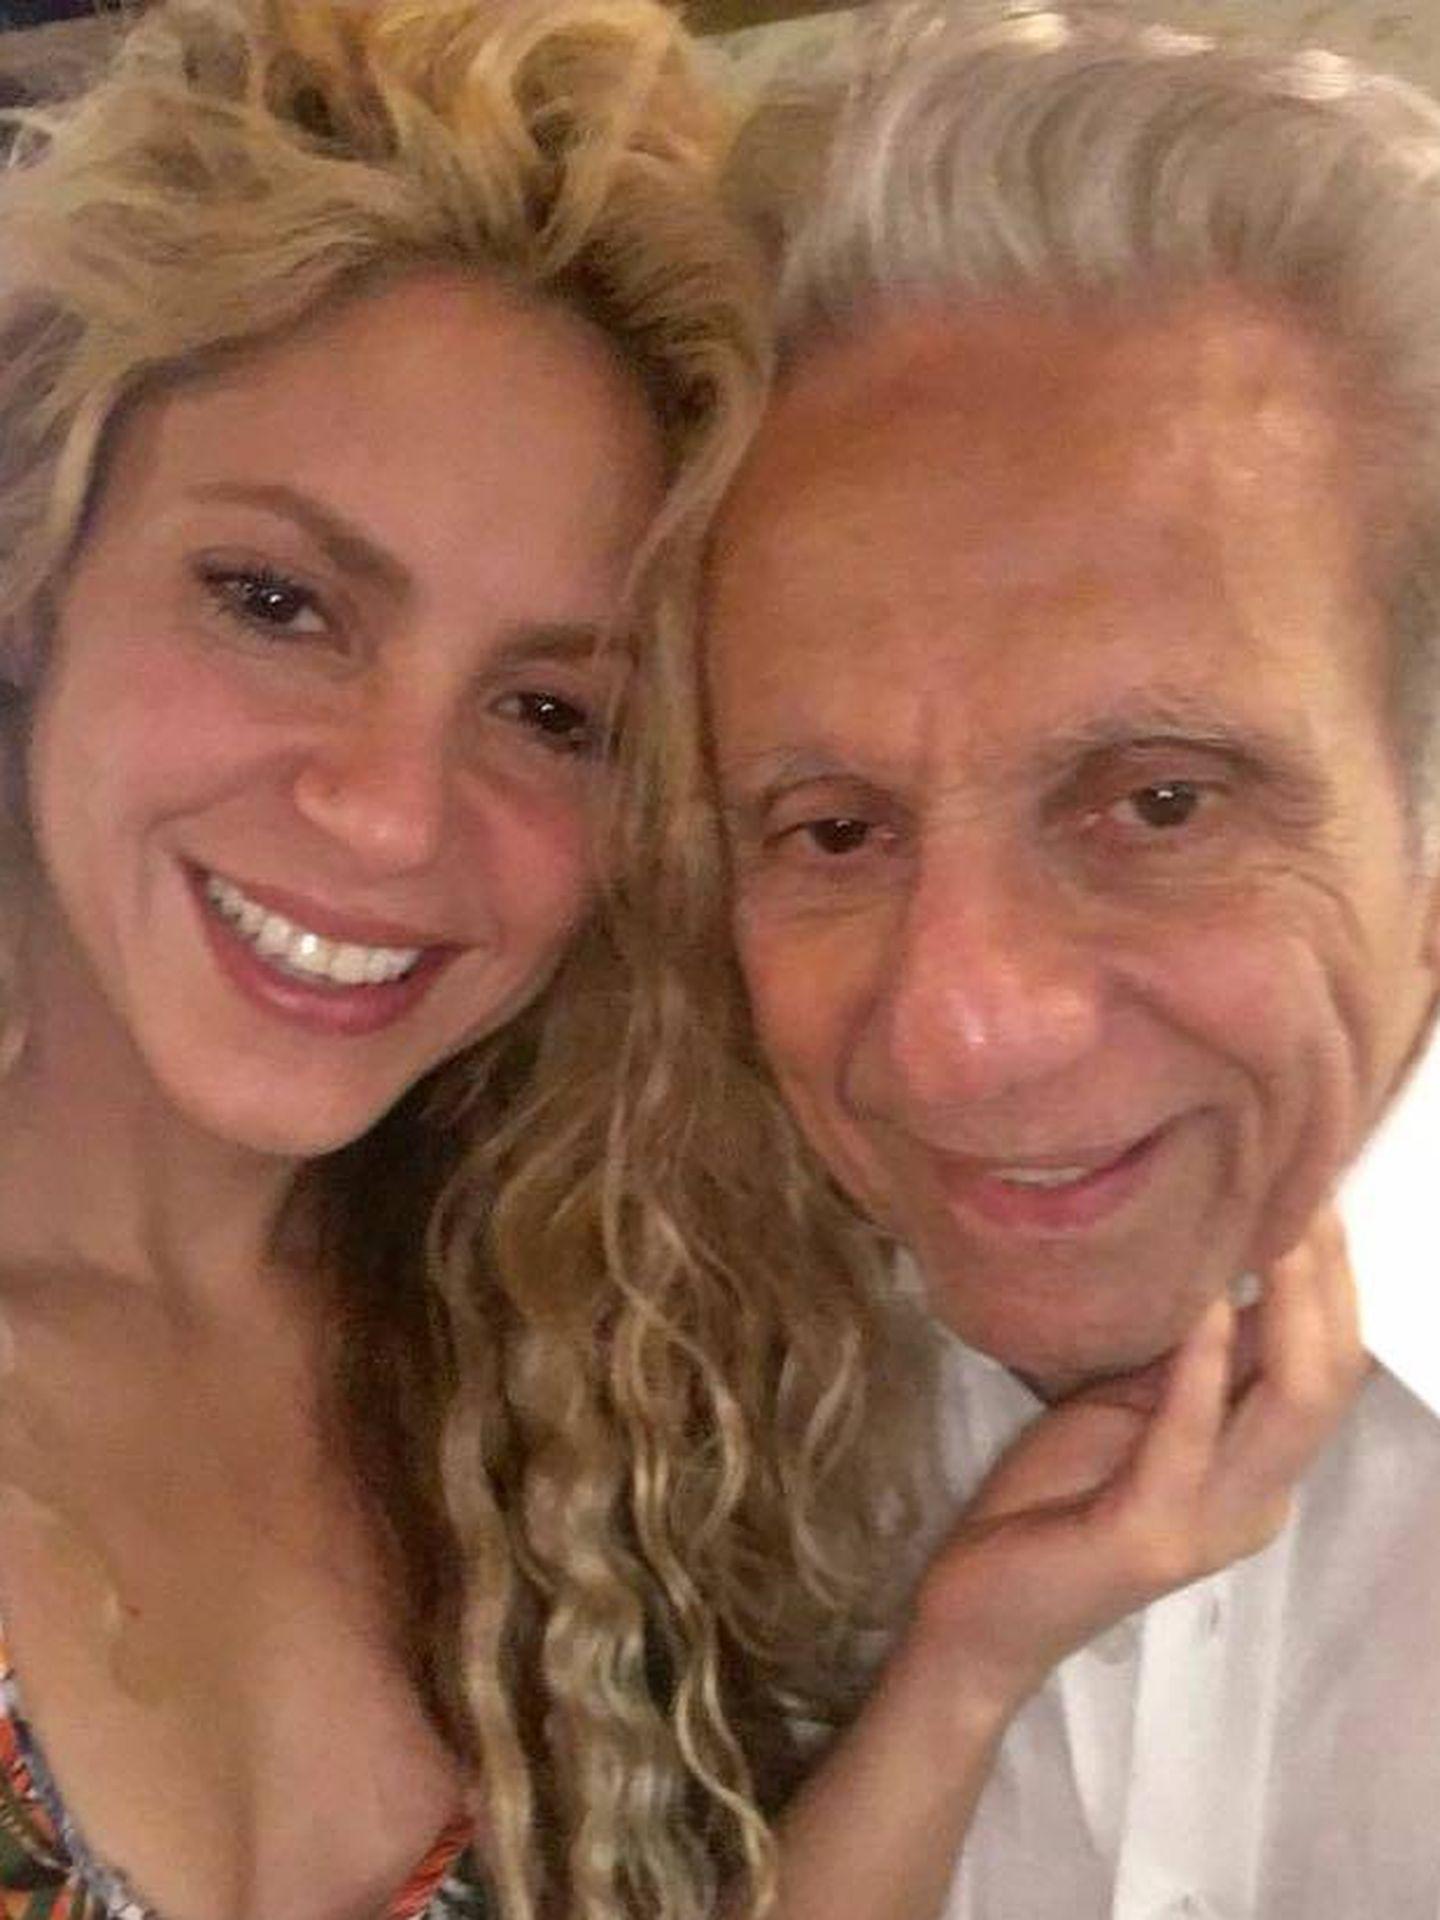 Shakira con su padre, William Mebarak, hace un año. (Facebook)